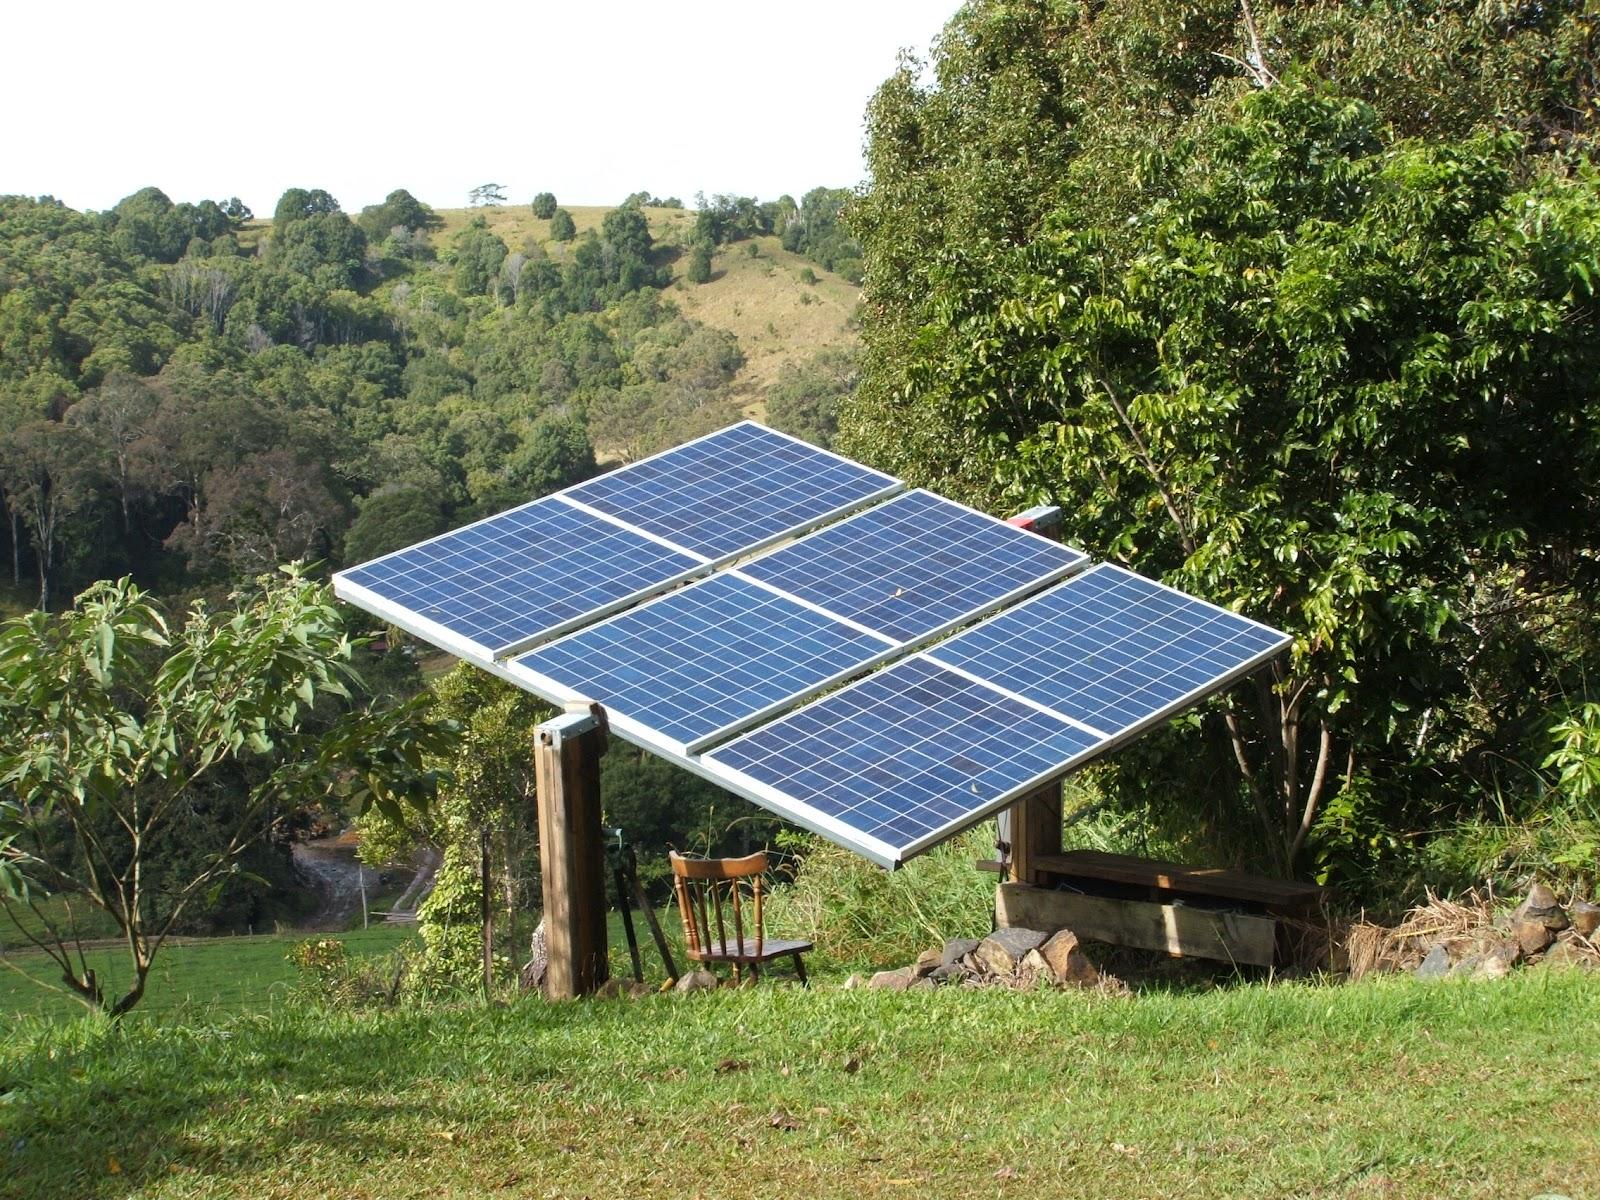 Solar Panel System Wiring Diagram Offgrid Solar Power Systems